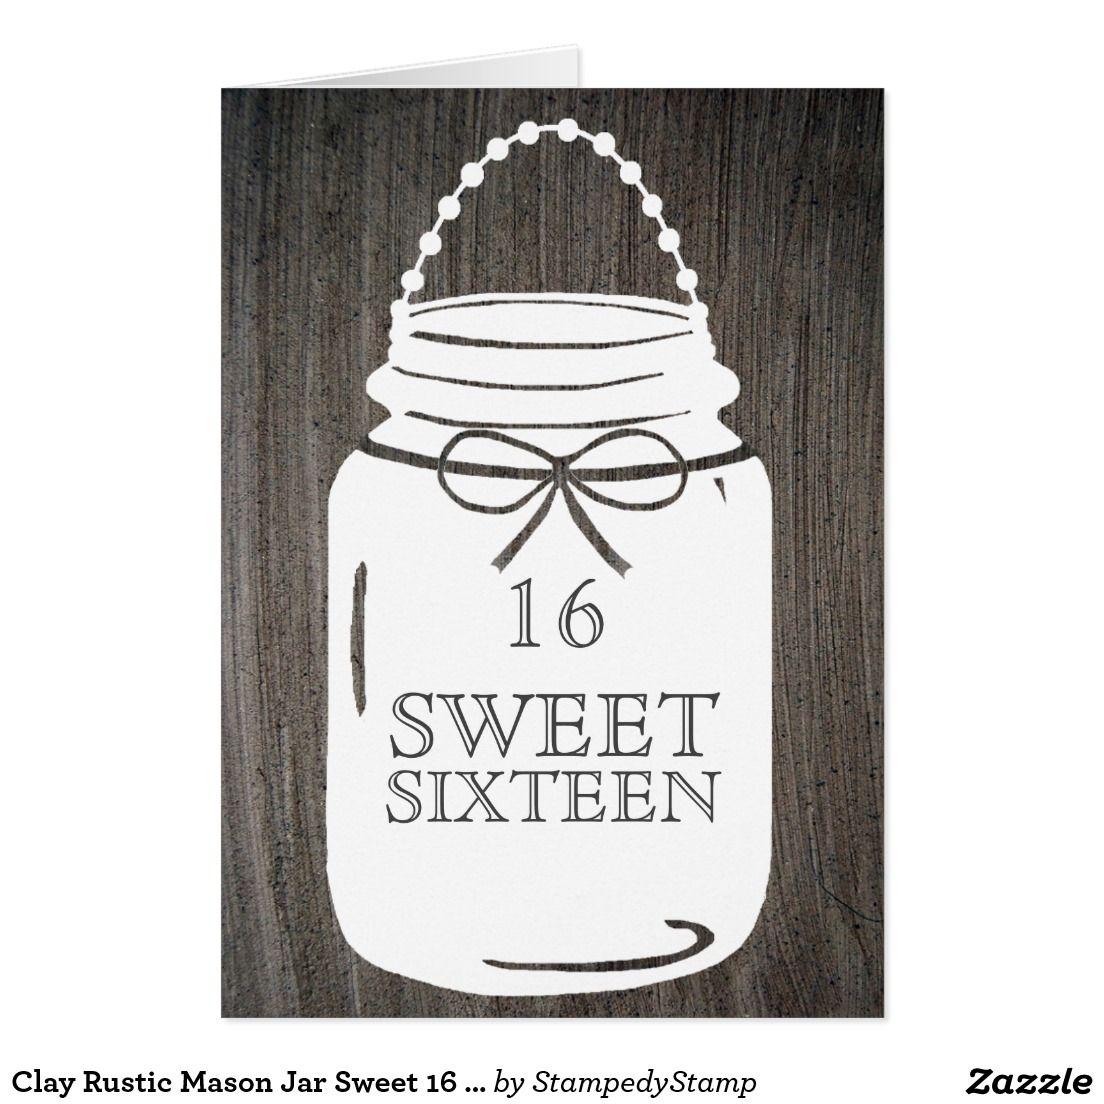 Clay Rustic Mason Jar Sweet 16 Birthday Invitation | BIRTHDAY ...